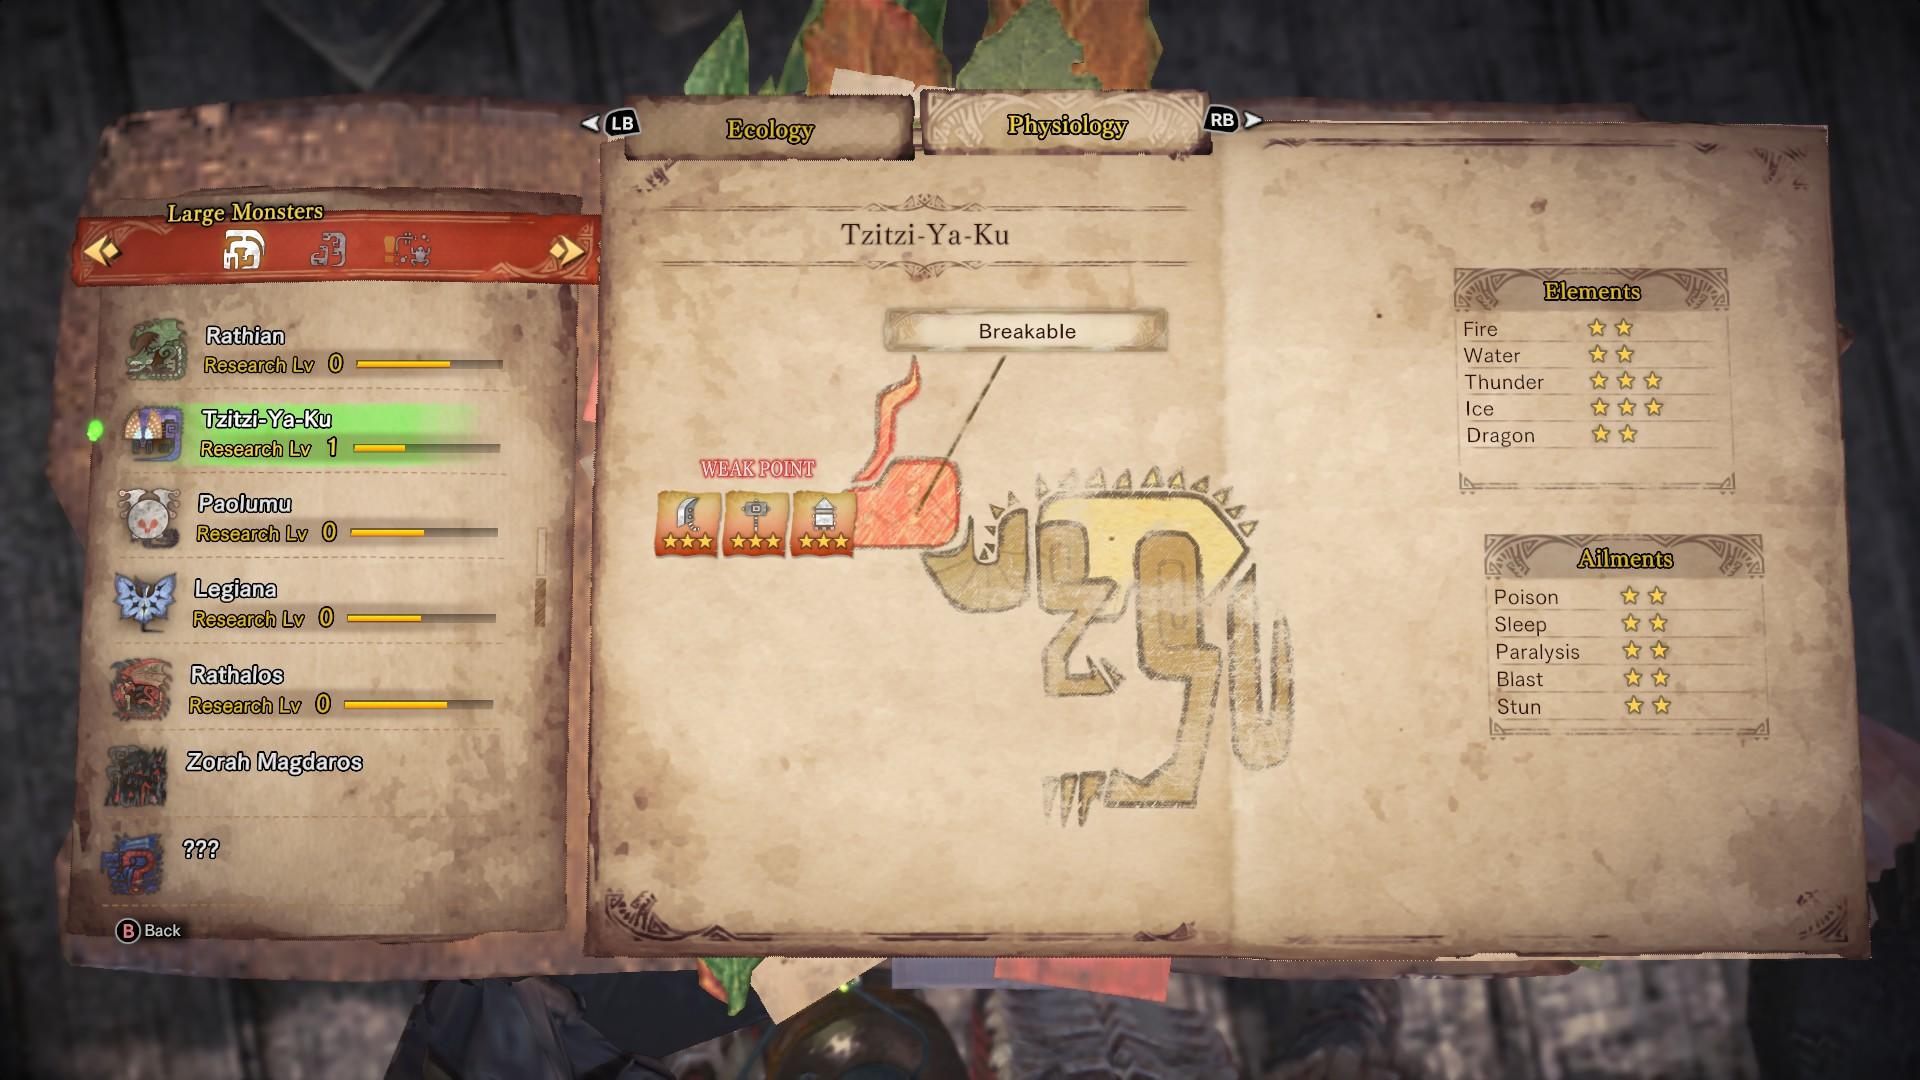 Tzitzi-Ya-Ku's entry in the monster field guide.